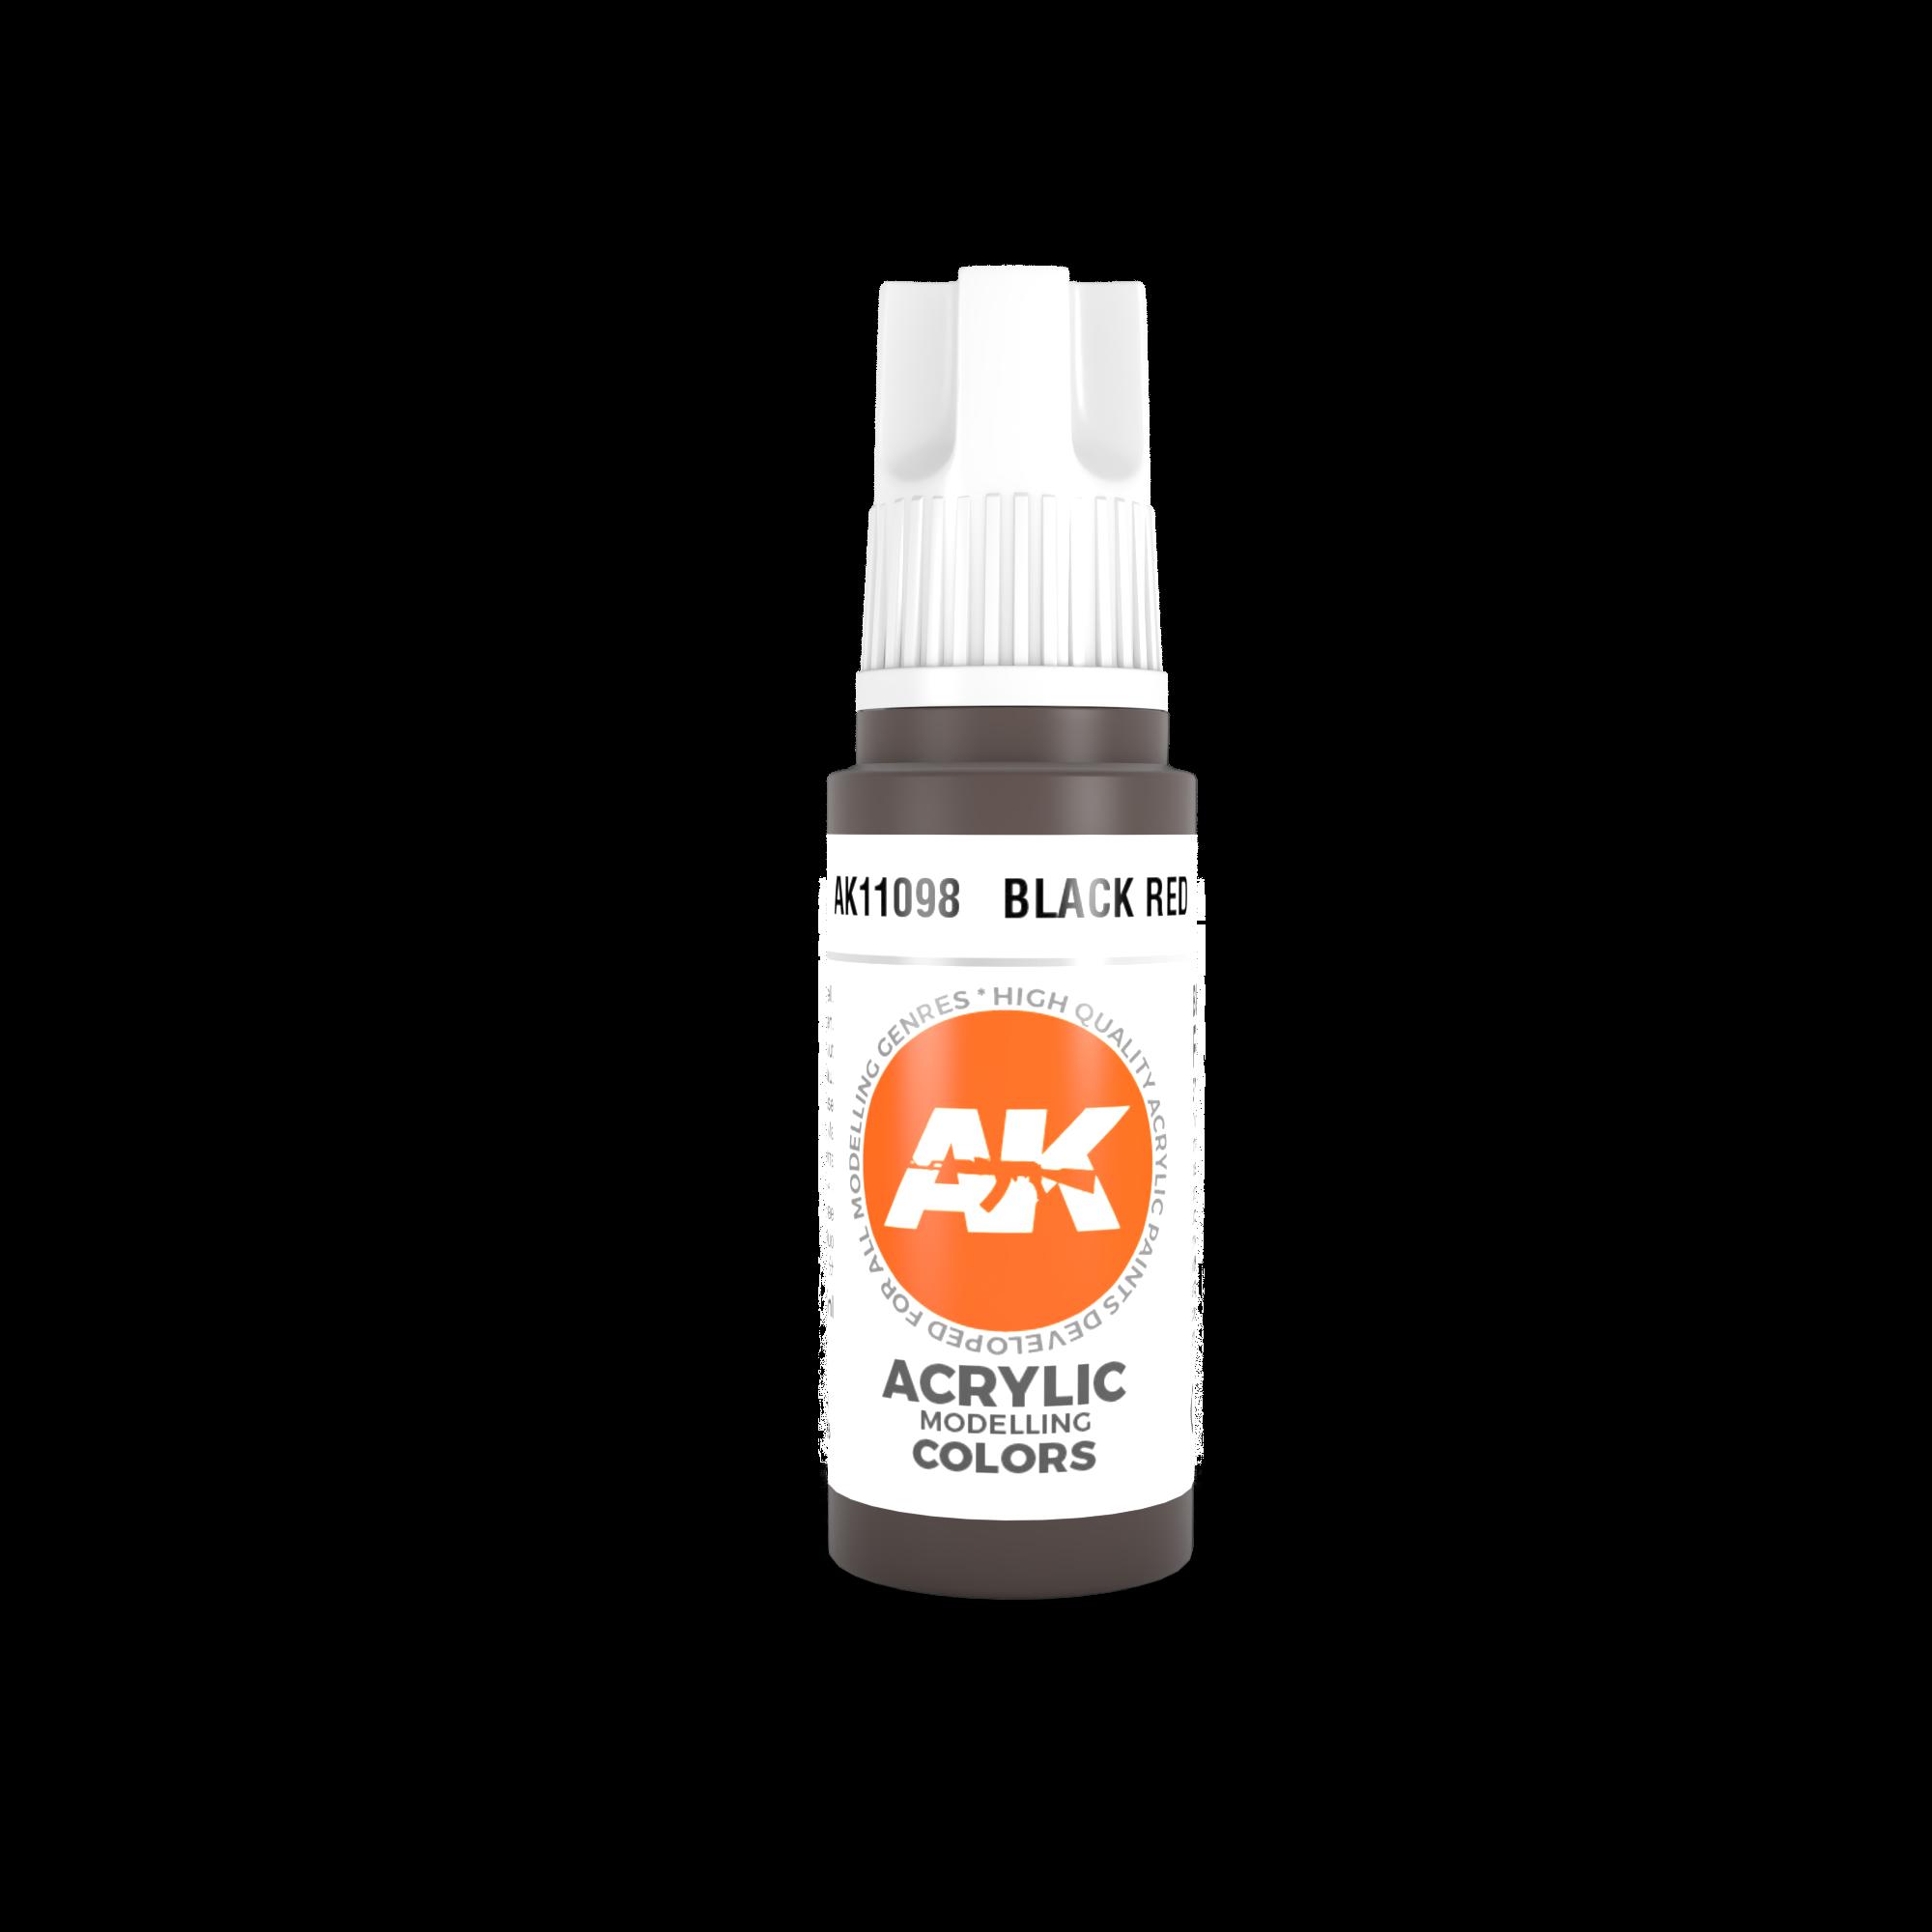 AK-Interactive Black Red Acrylic Modelling Color - 17ml - AK-11098